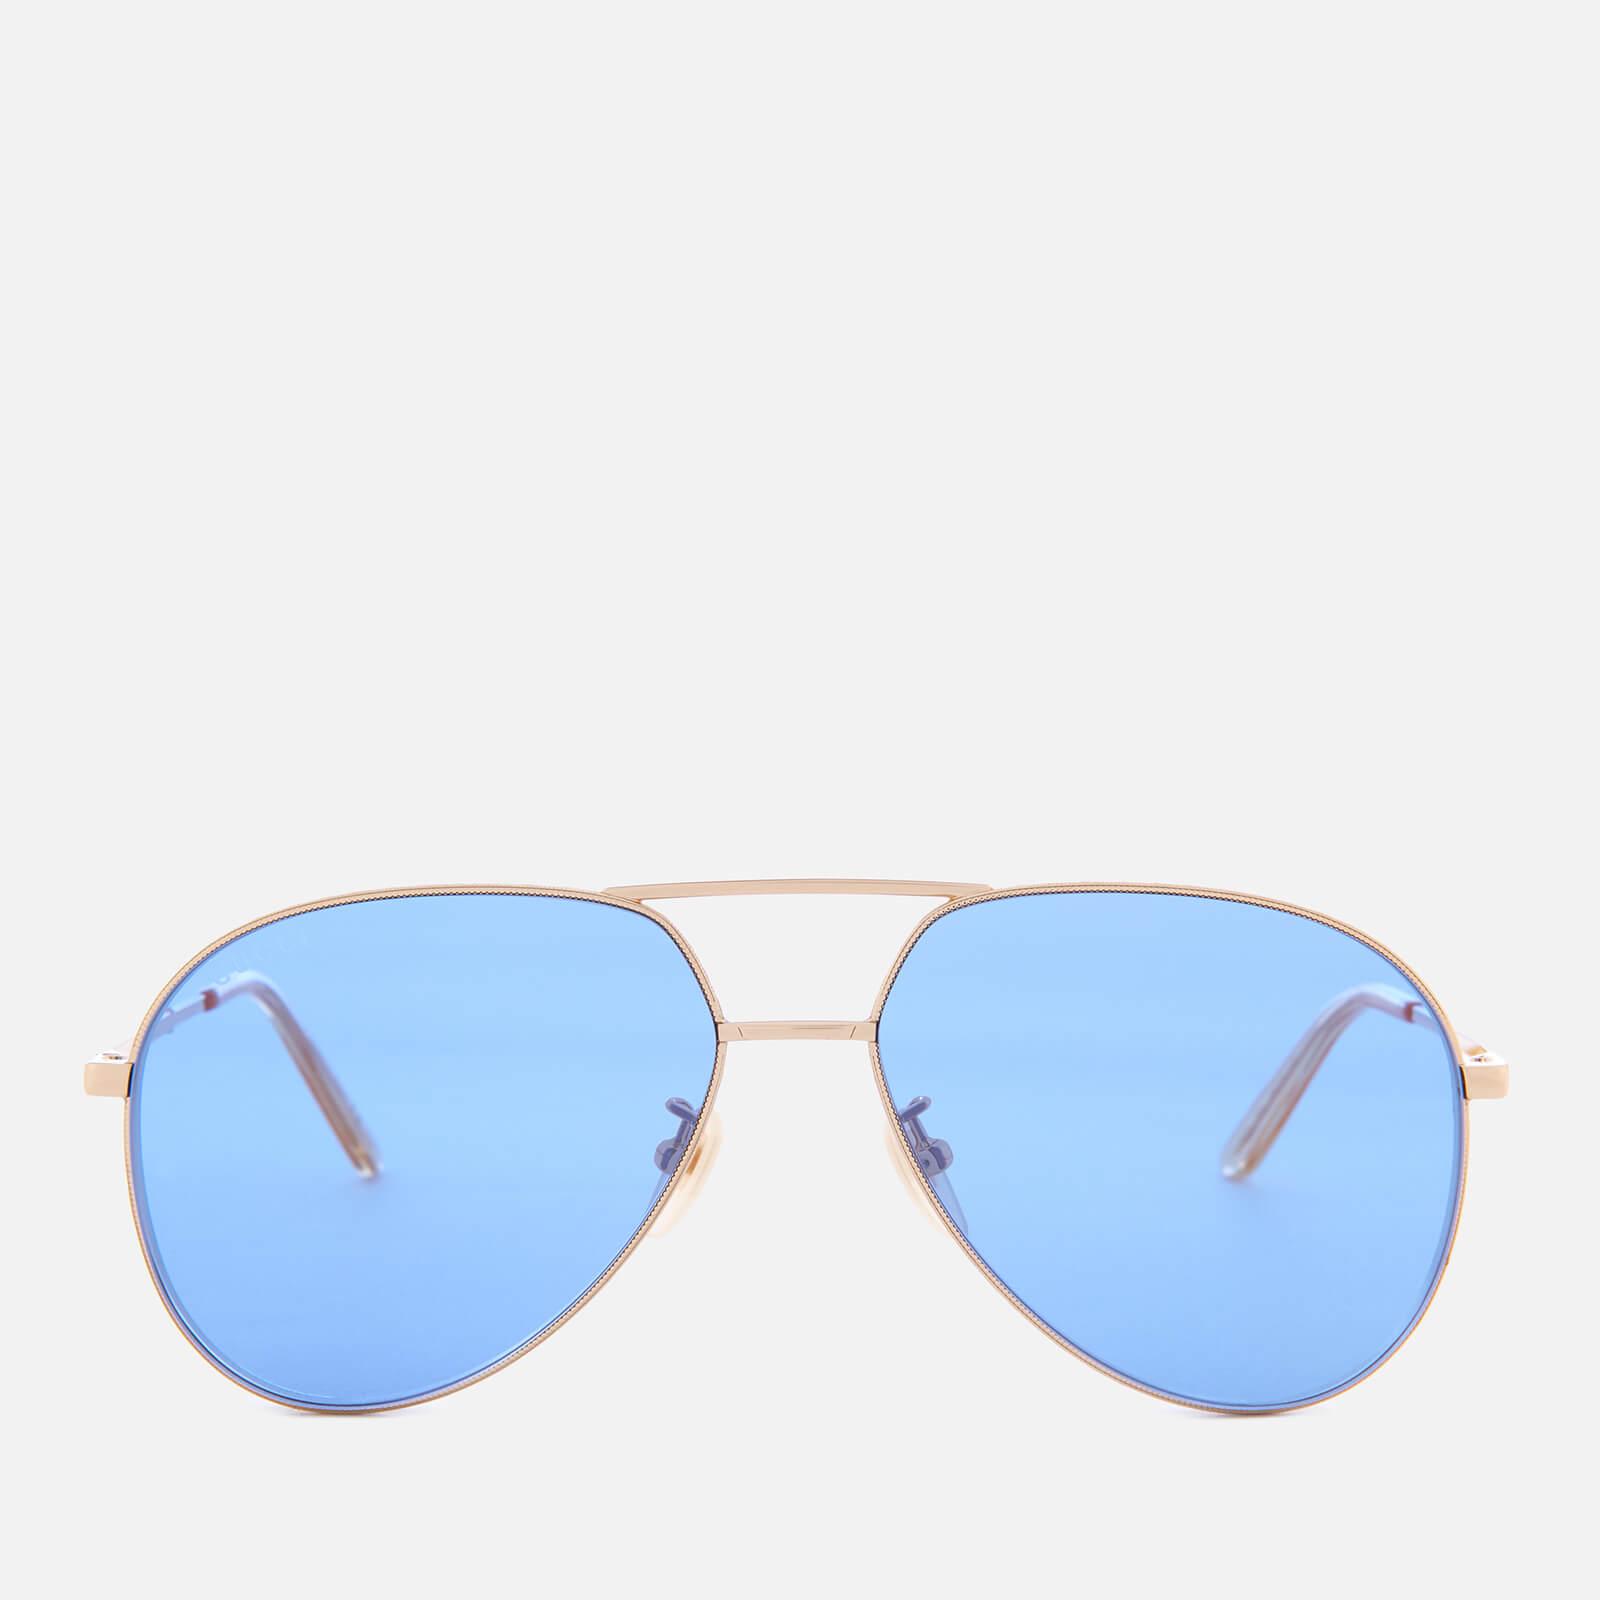 00da372710e Gucci Metal Frame Sunglasses - Gold Blue - Free UK Delivery over £50